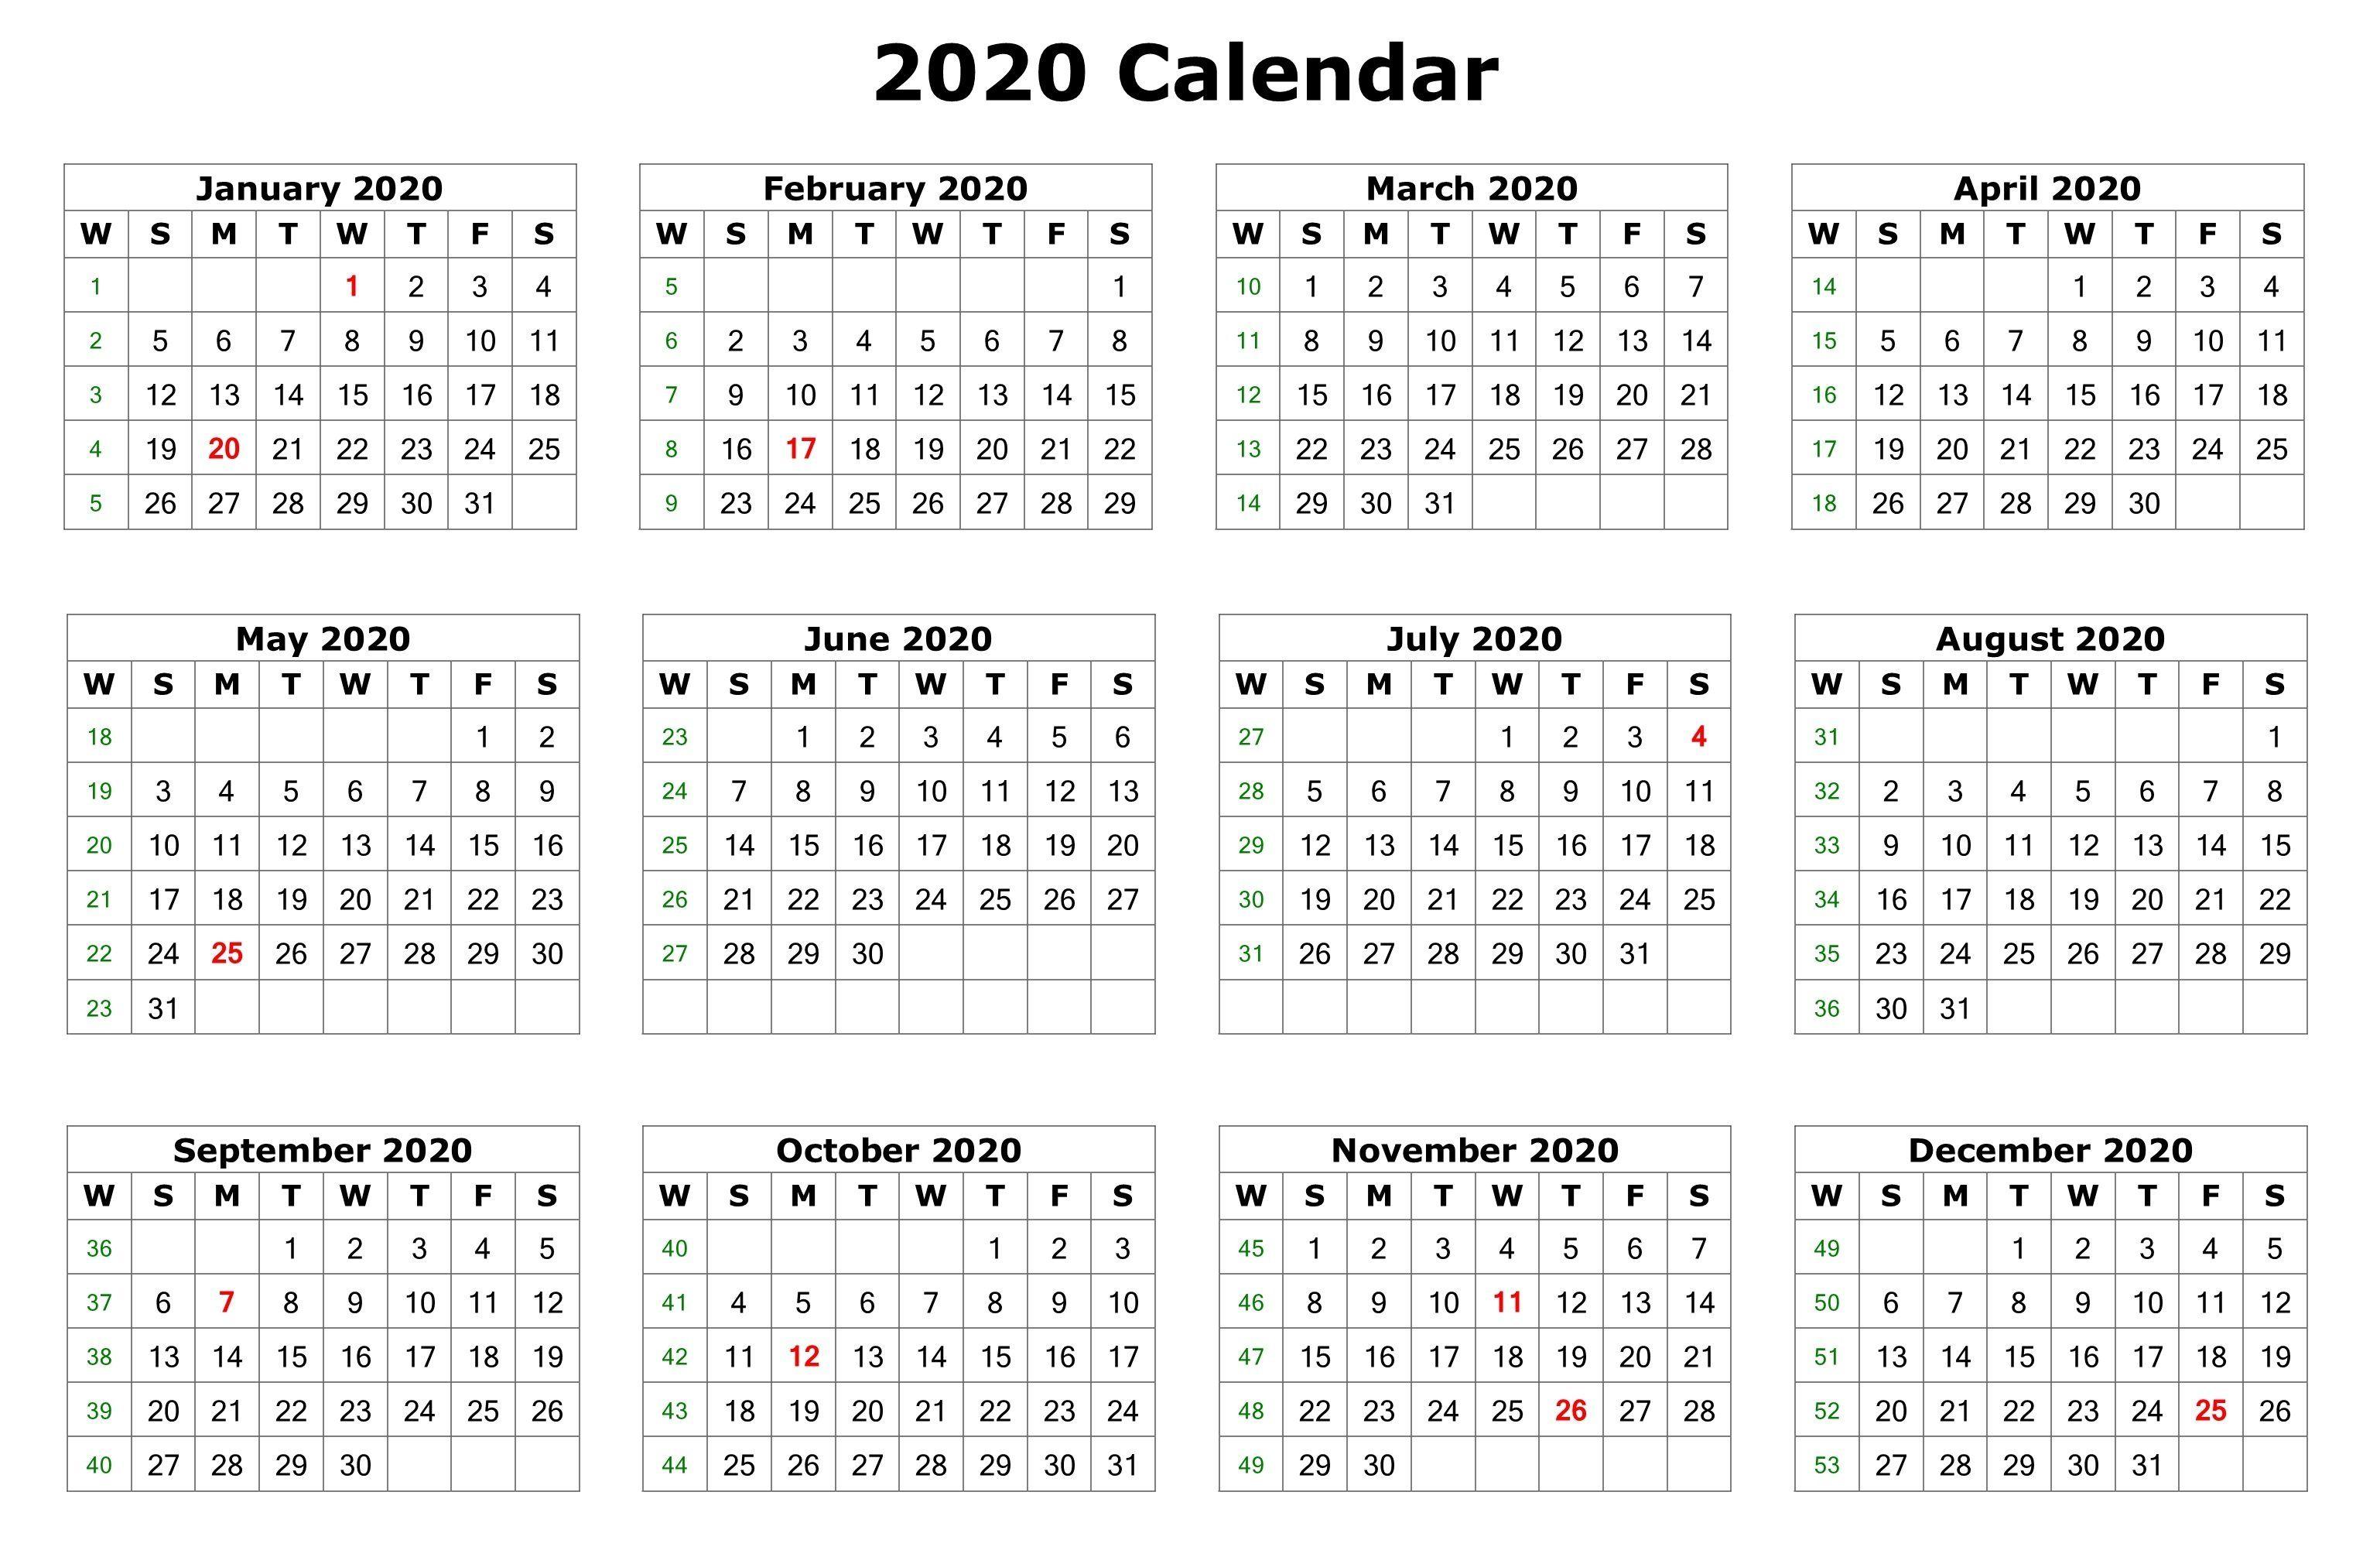 2020 12 Months Calendar Printable | Printable Calendar 2020 in 2020 Printable Calendar All Months